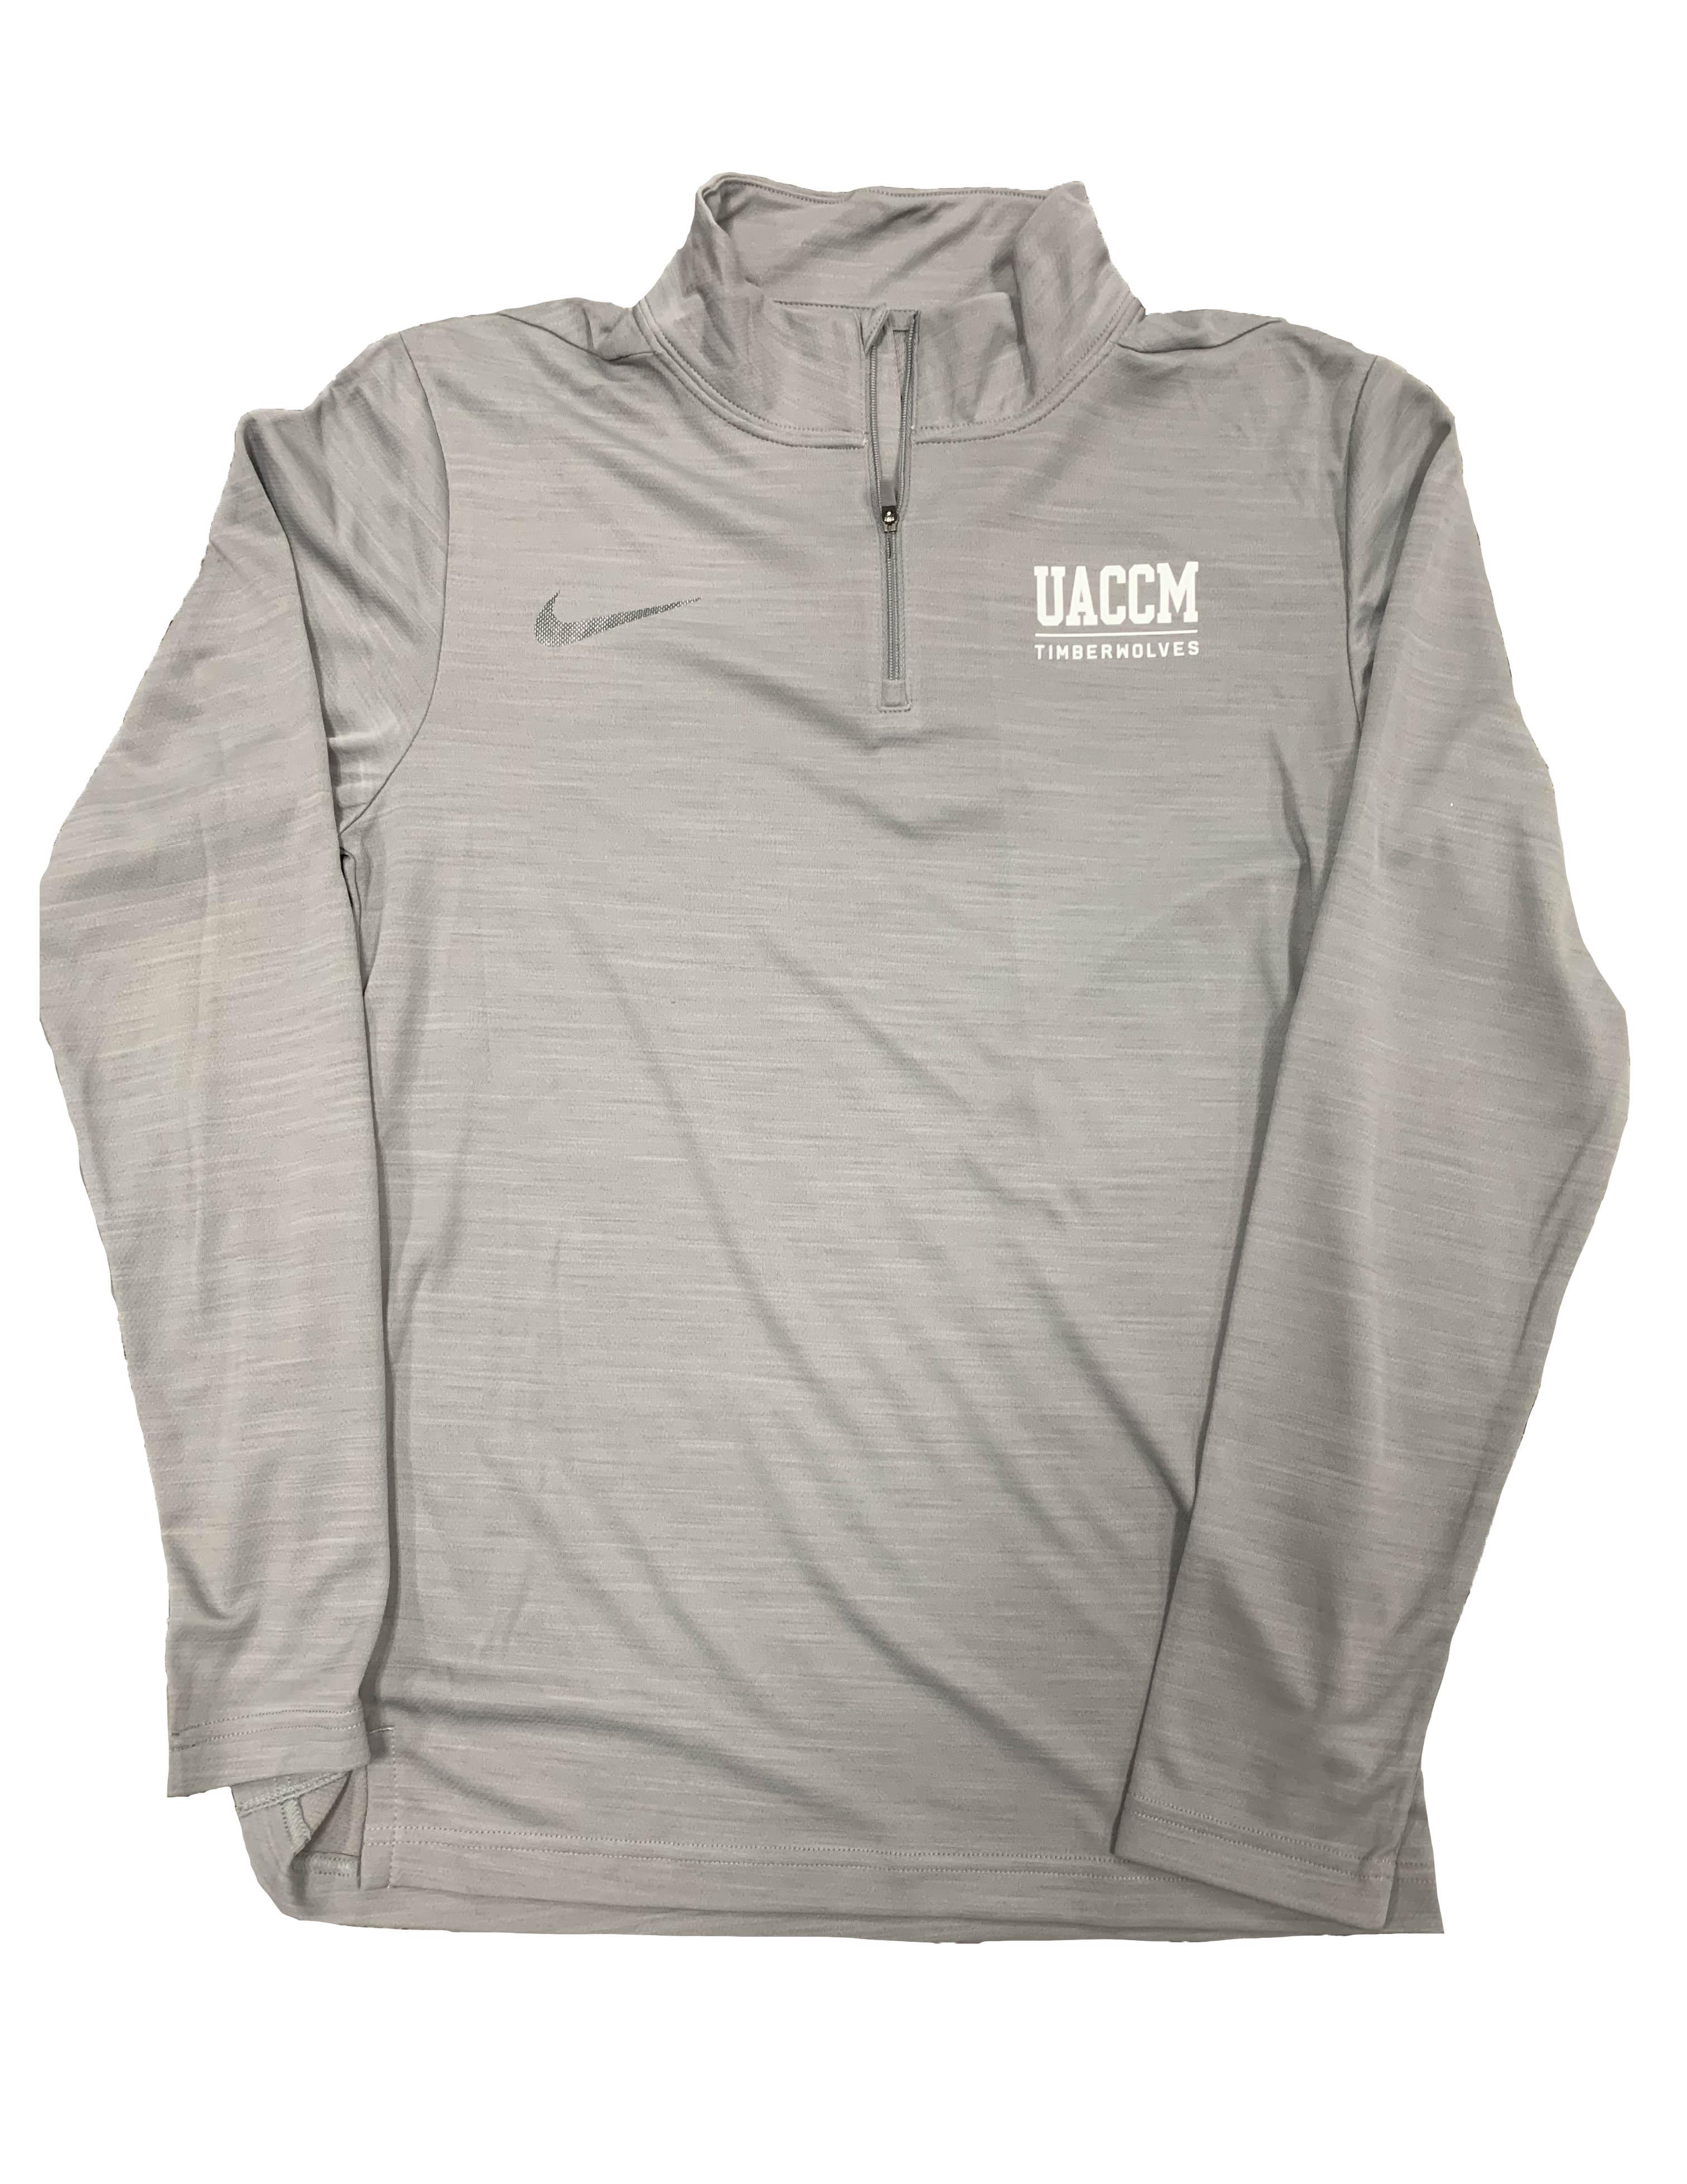 Nike UACCM 1/4 Zip Jackets